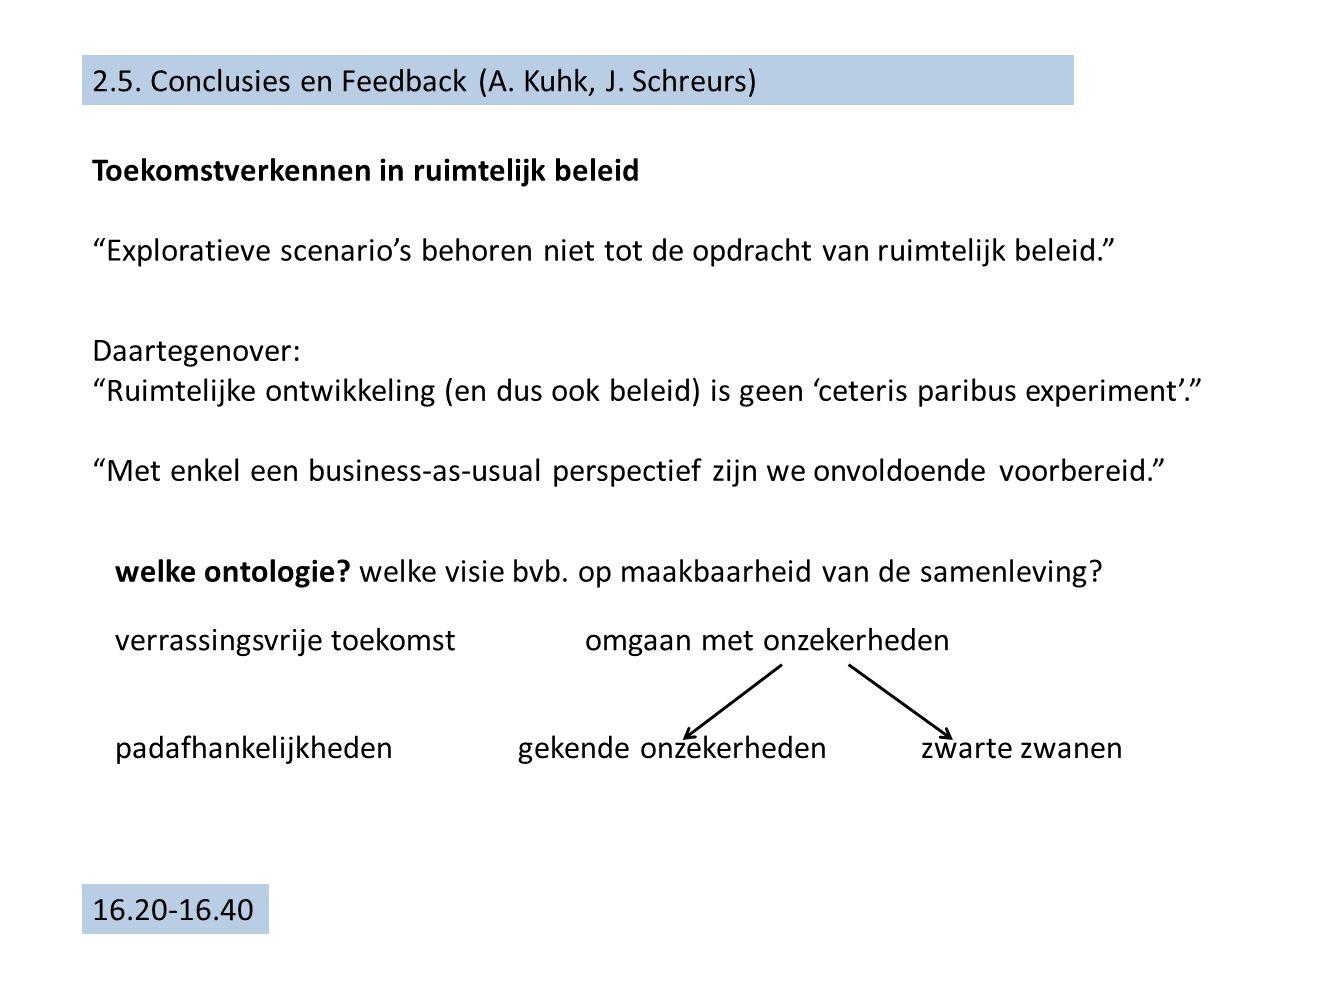 2.5. Conclusies en Feedback (A. Kuhk, J.